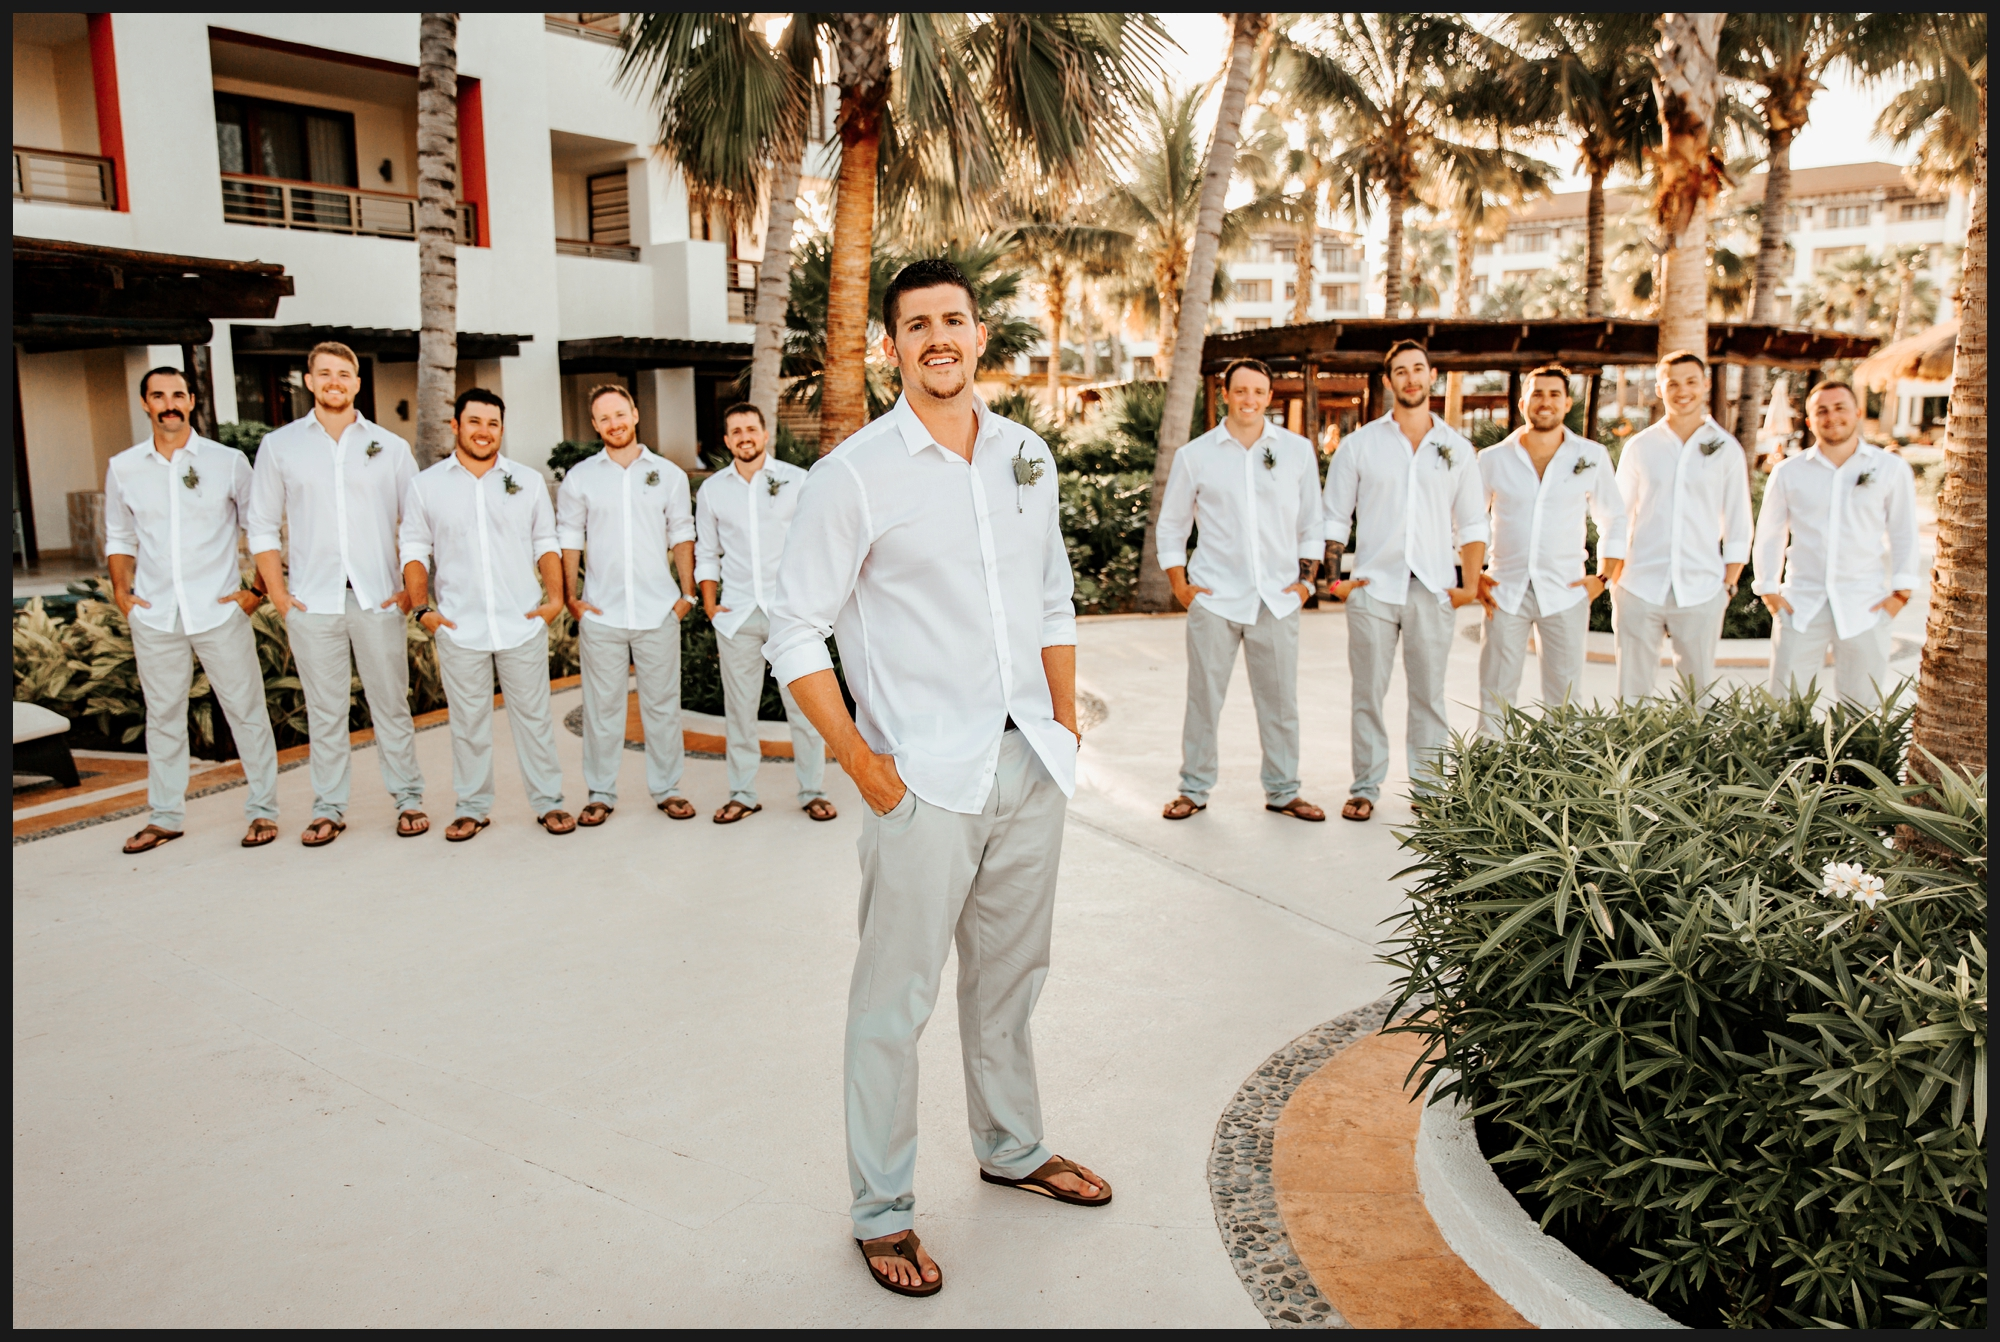 Orlando-Wedding-Photographer-destination-wedding-photographer-florida-wedding-photographer-bohemian-wedding-photographer_0517.jpg